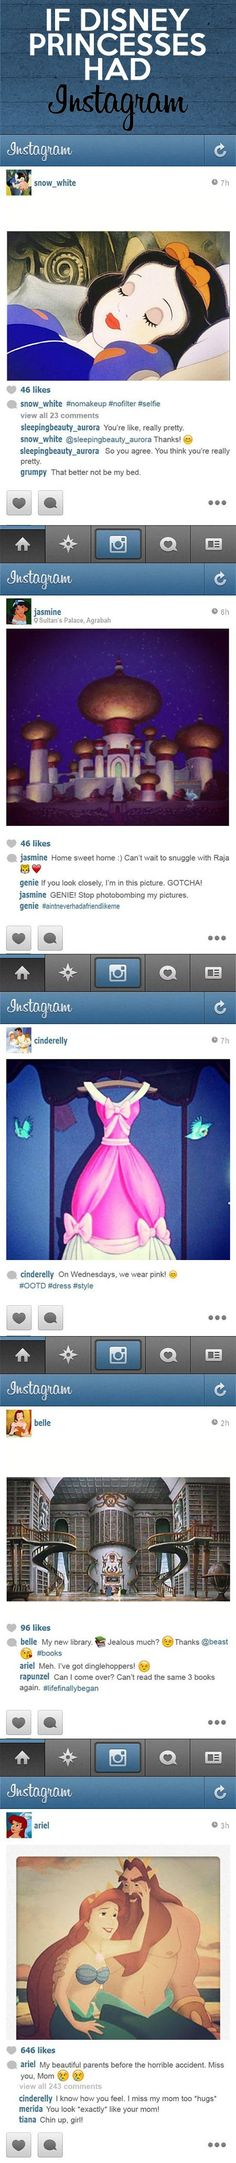 If Disney princesses had Instagram.. @Keely Gault Gault Gault Ripley